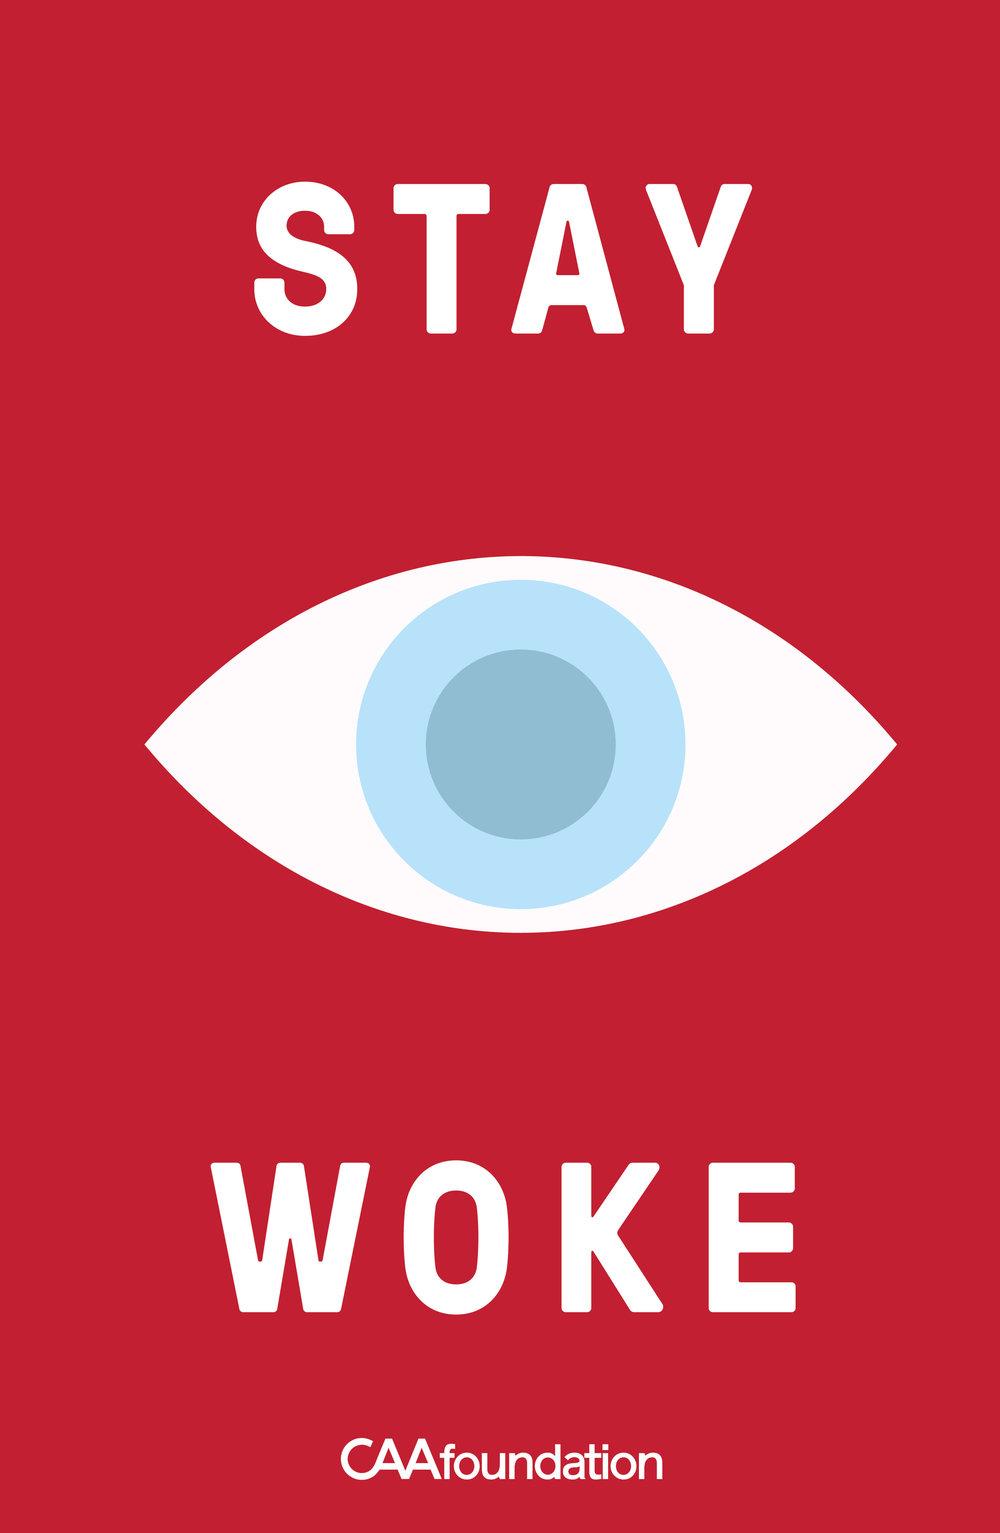 Take_Action_Posters_v5-22.jpg